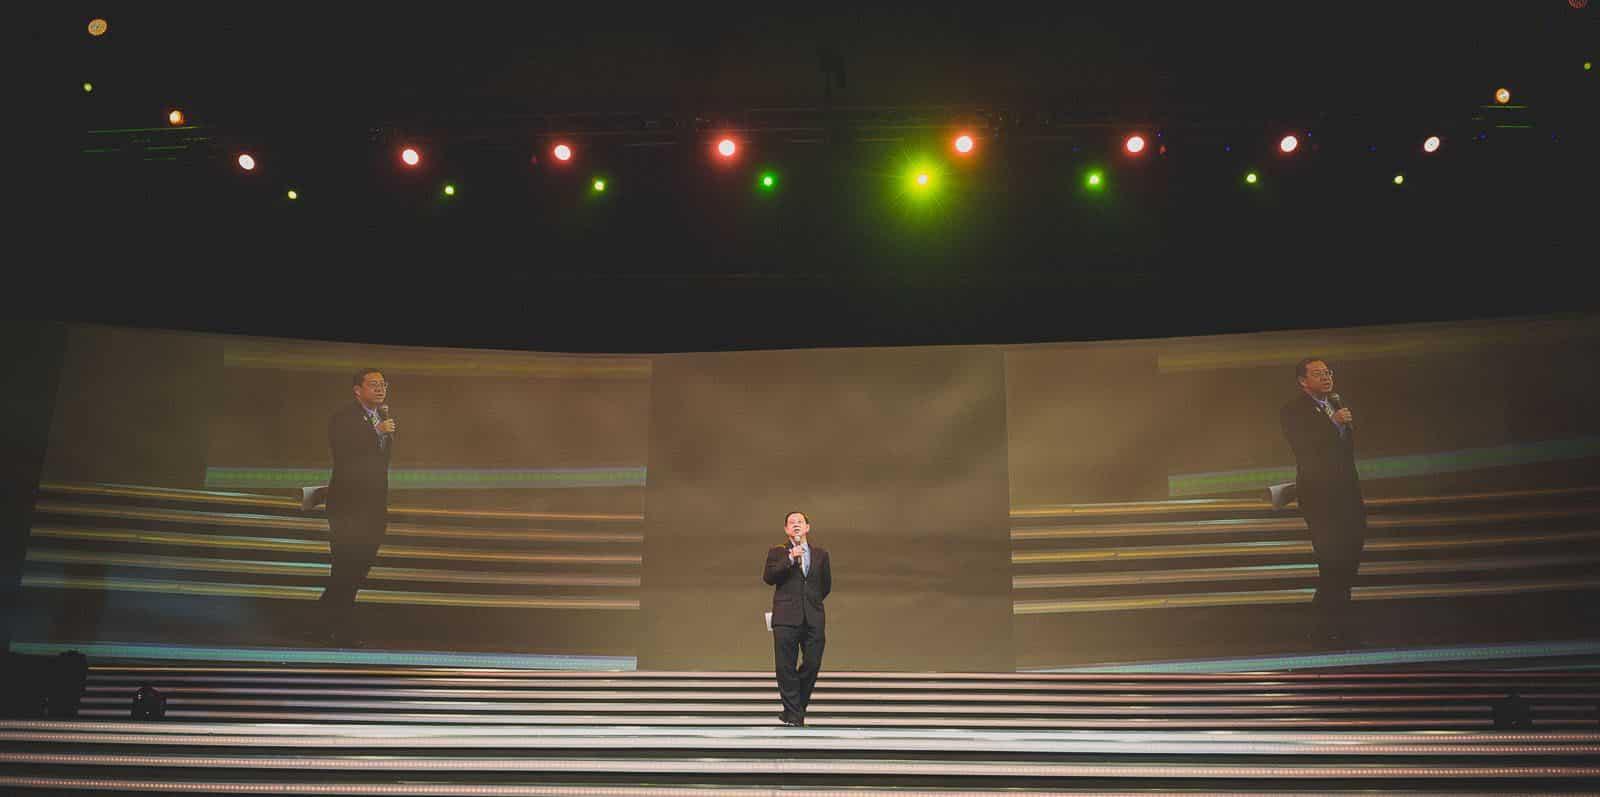 Best Corporate Event Photographer Malaysia | Stage Speech Photography Kuala Lumpur